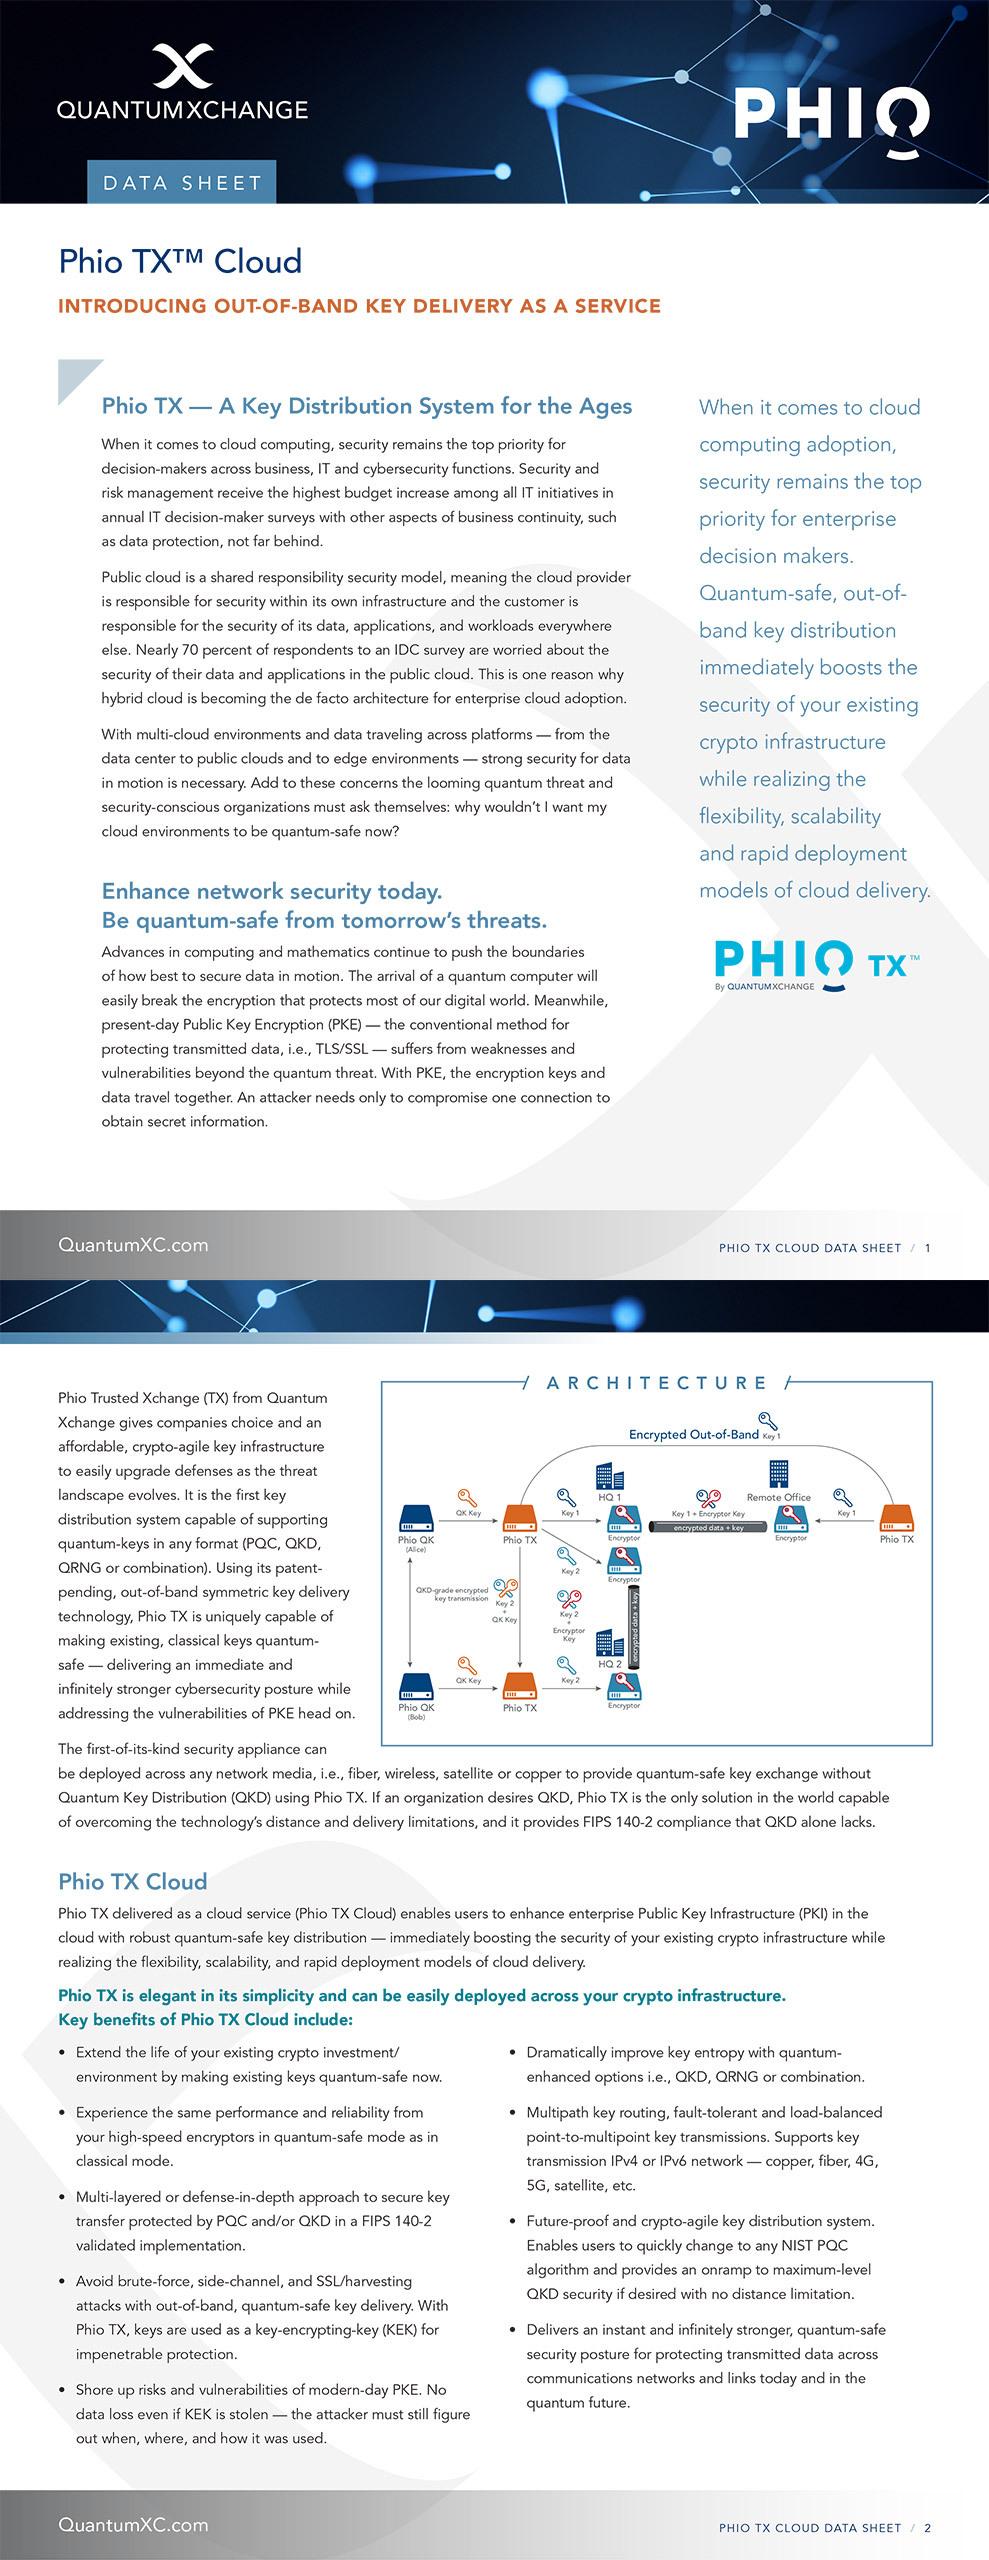 Phio TX cloud data sheet section 1